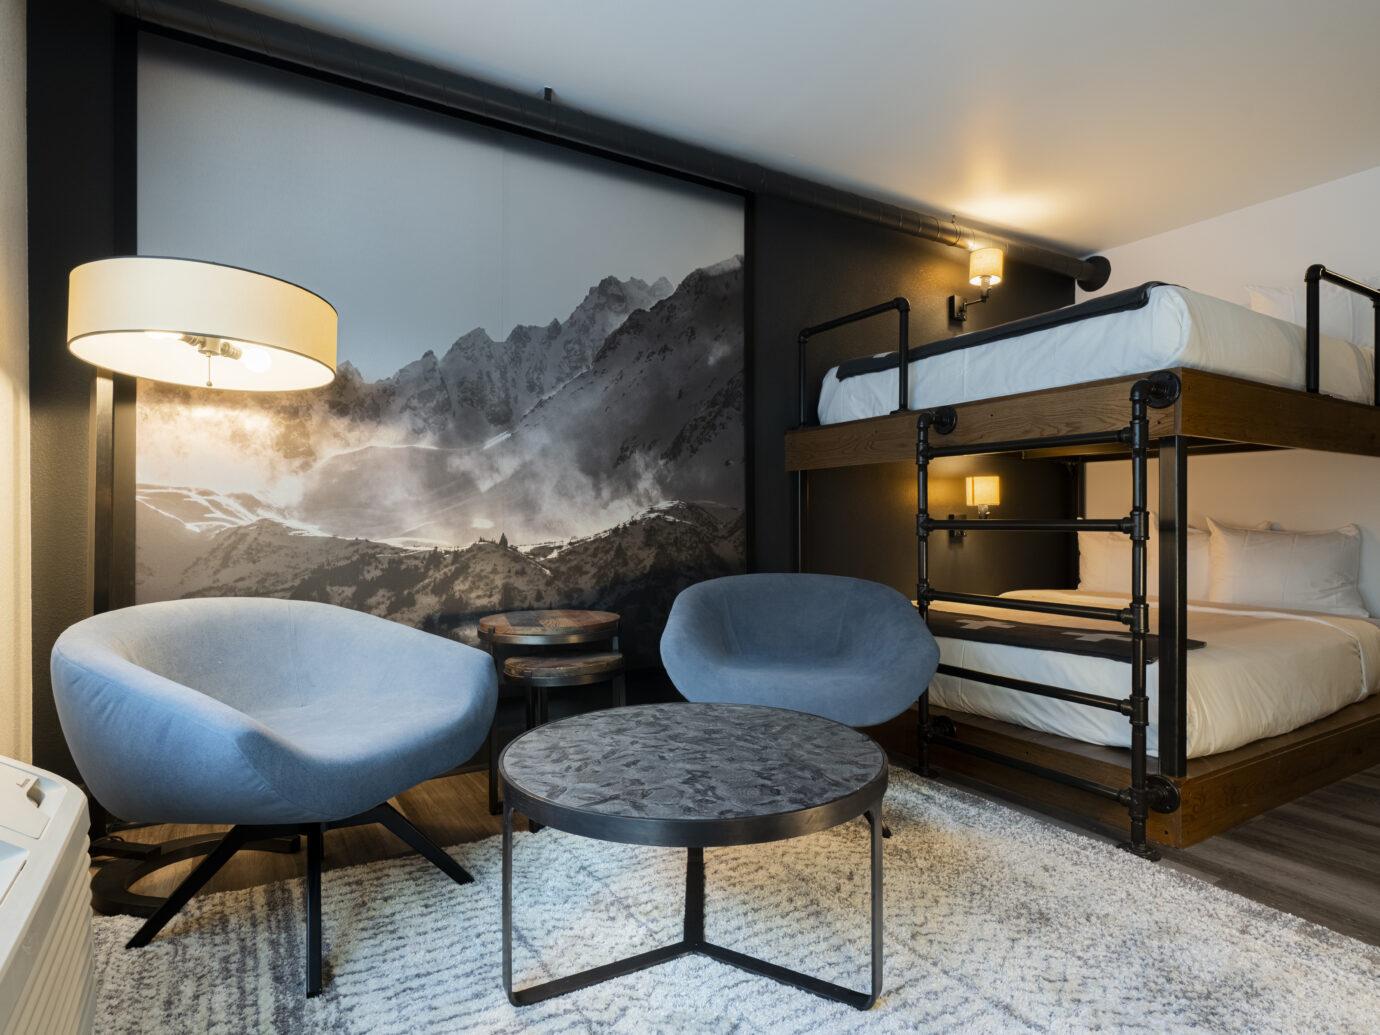 Bedroom at Gravity Haus